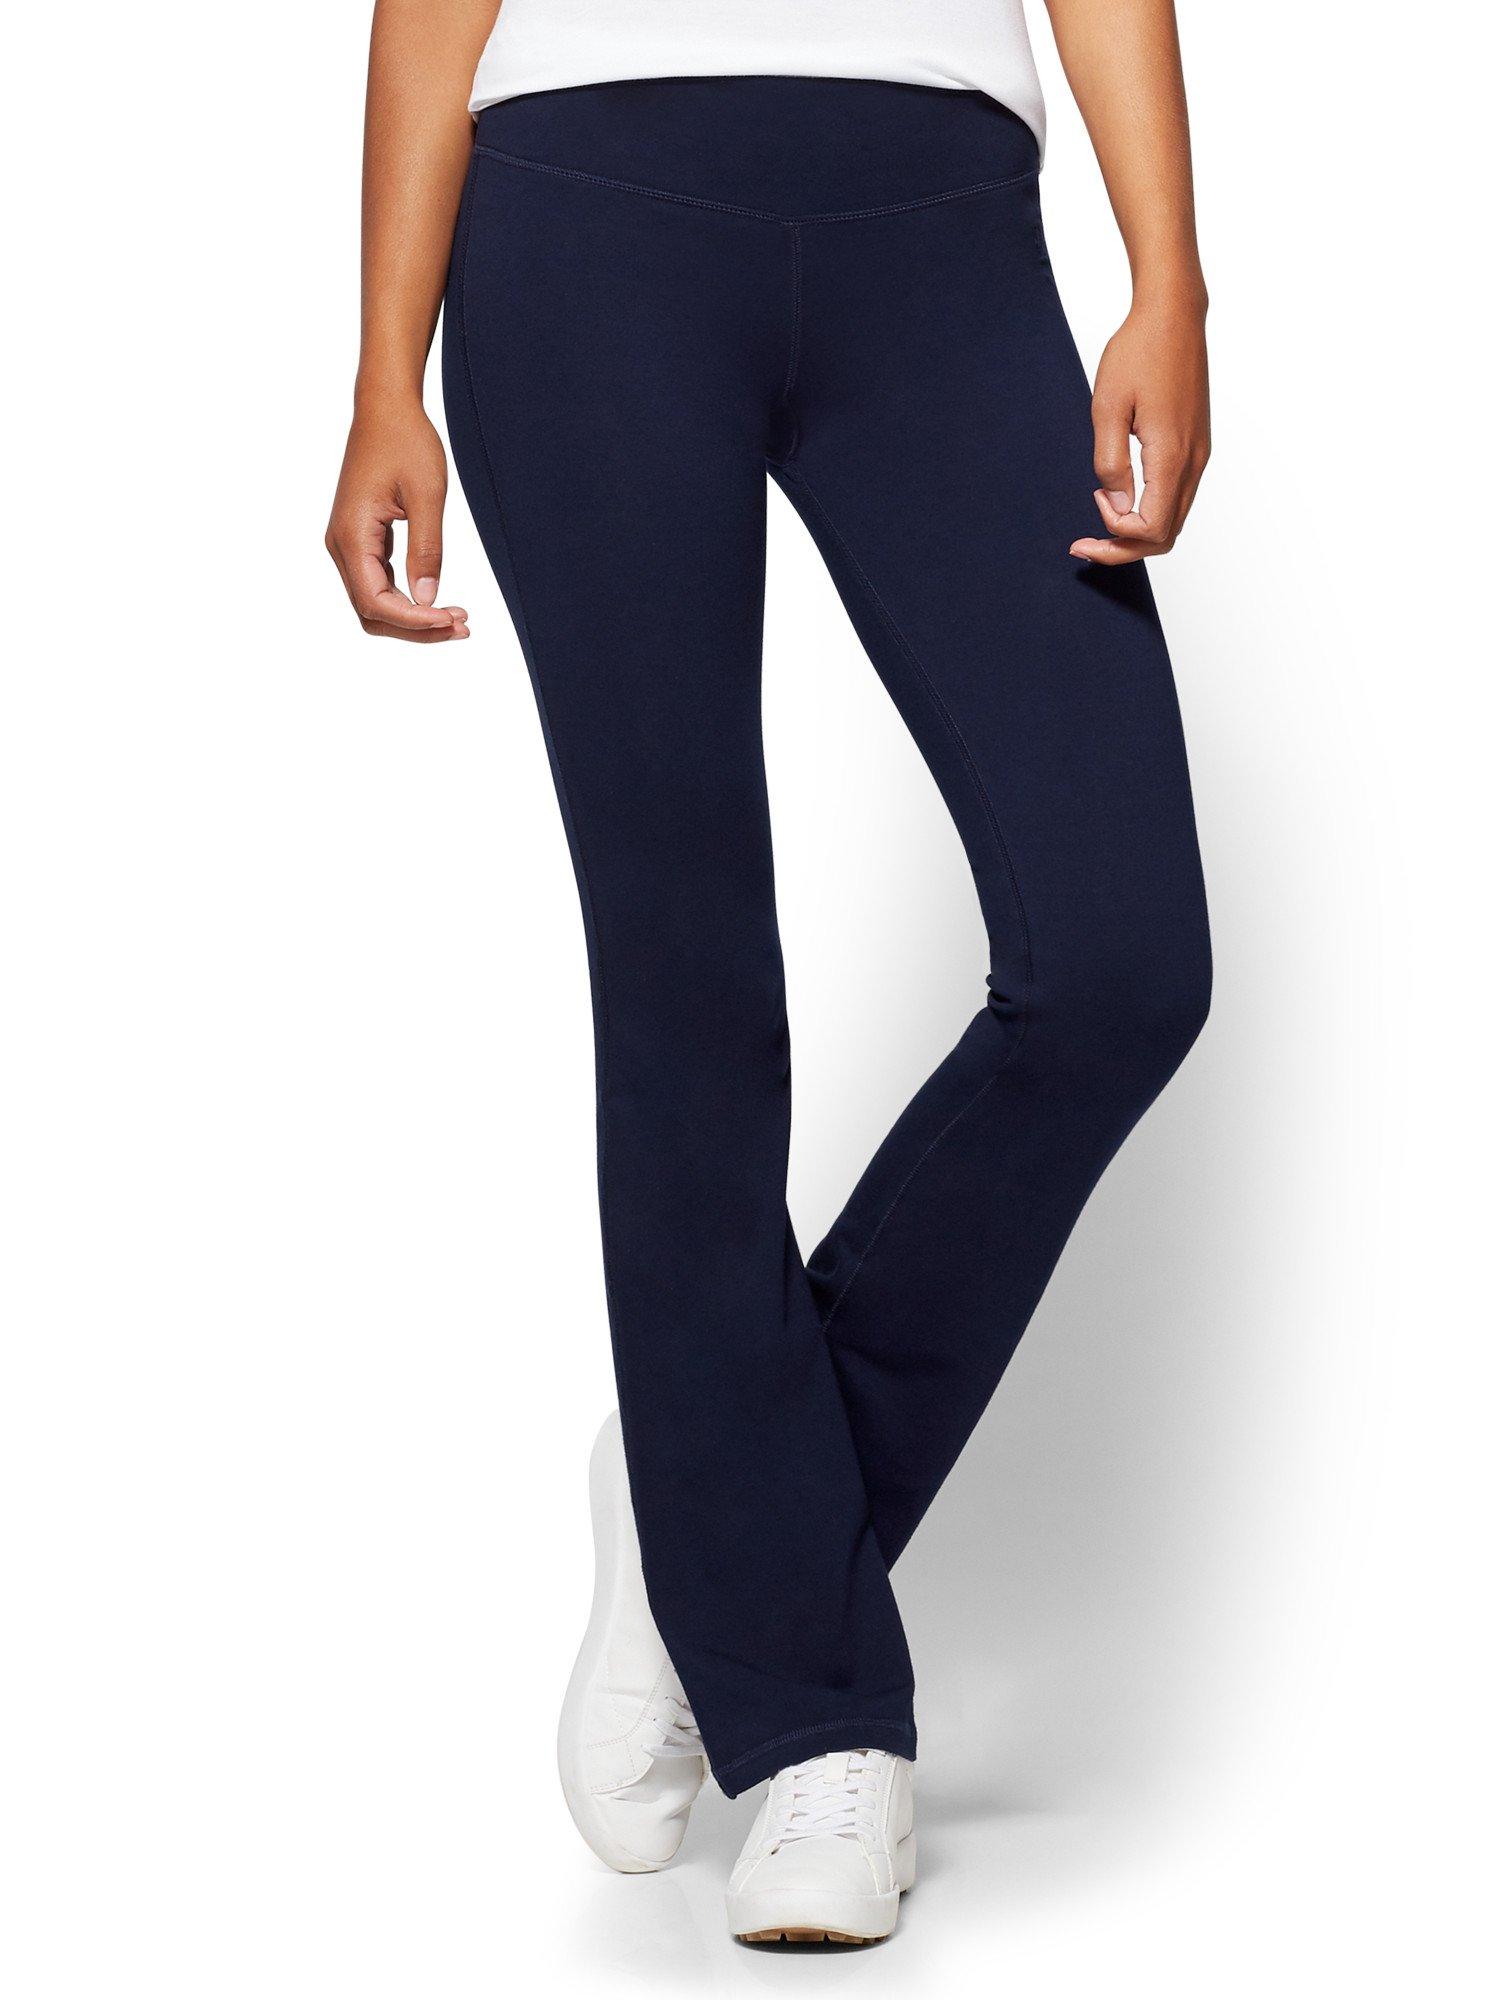 New York & Co. Women's Petite Bootcut Yoga Pant Small Grand Sapphire